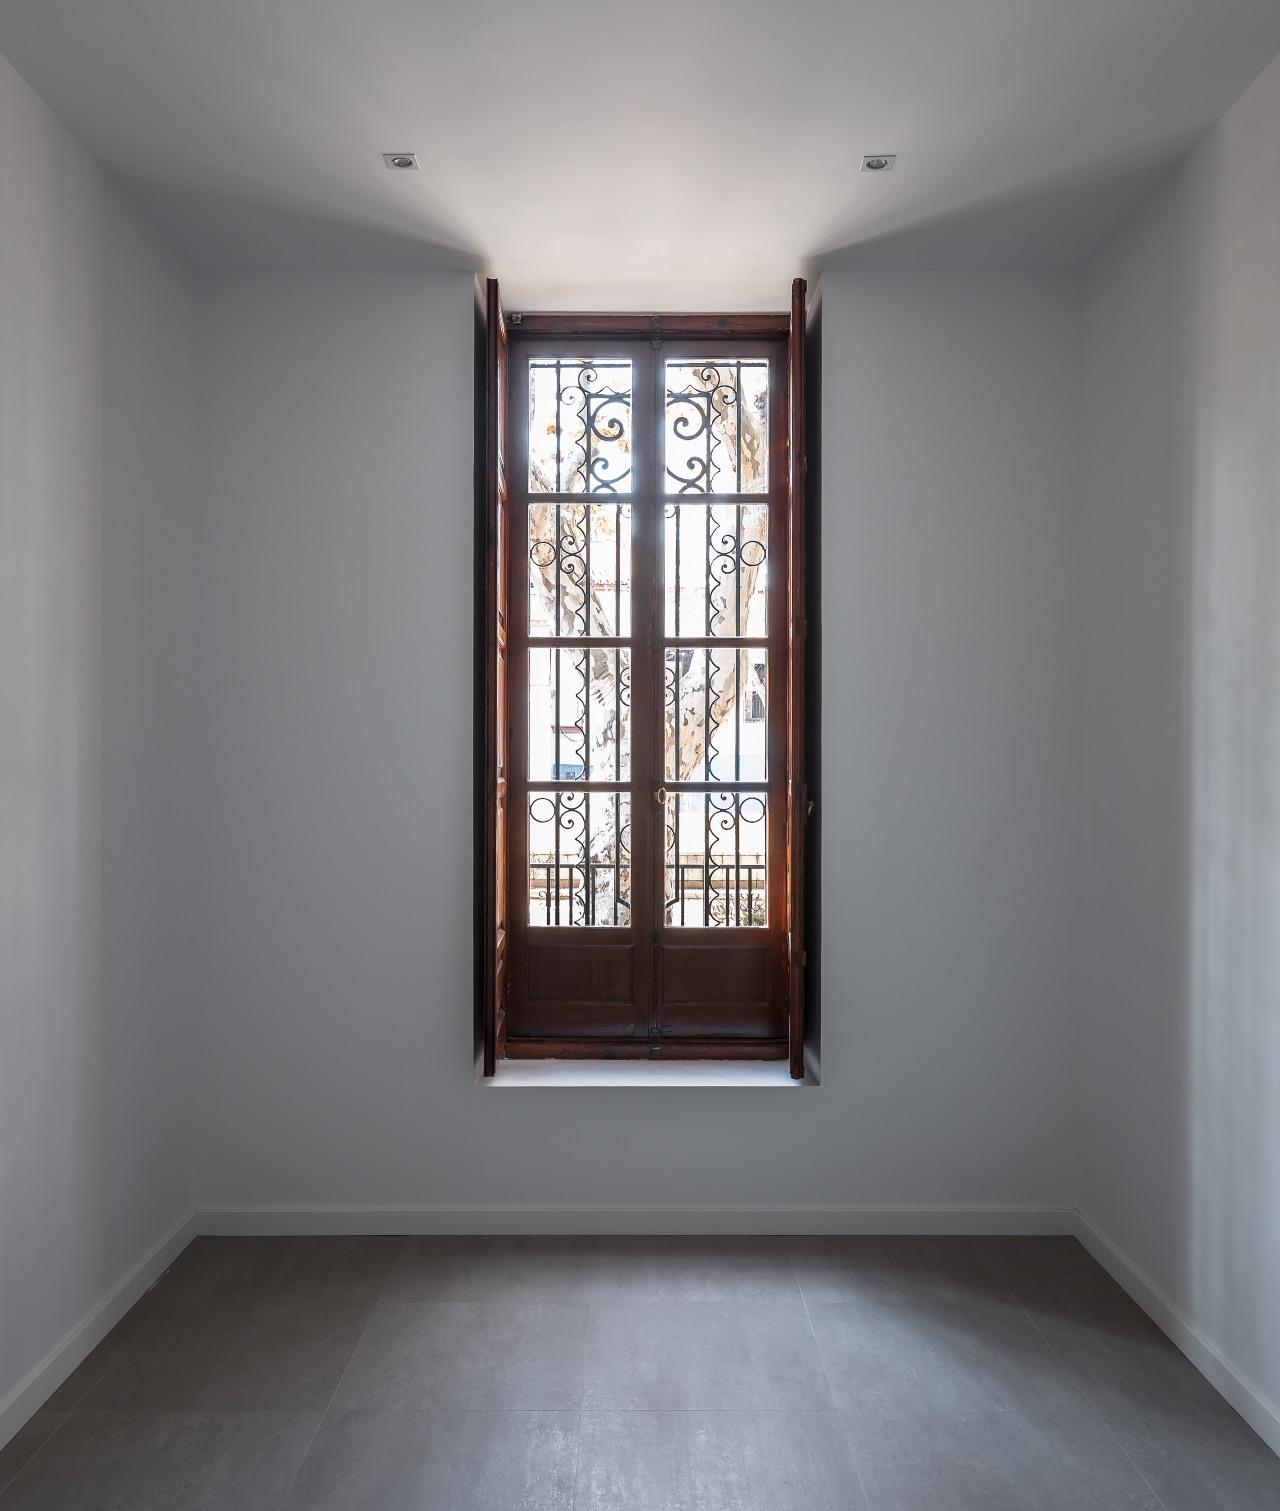 fotografia-arquitectura-valencia-german-cabo-viraje-rehabilitacion-campanar (12)